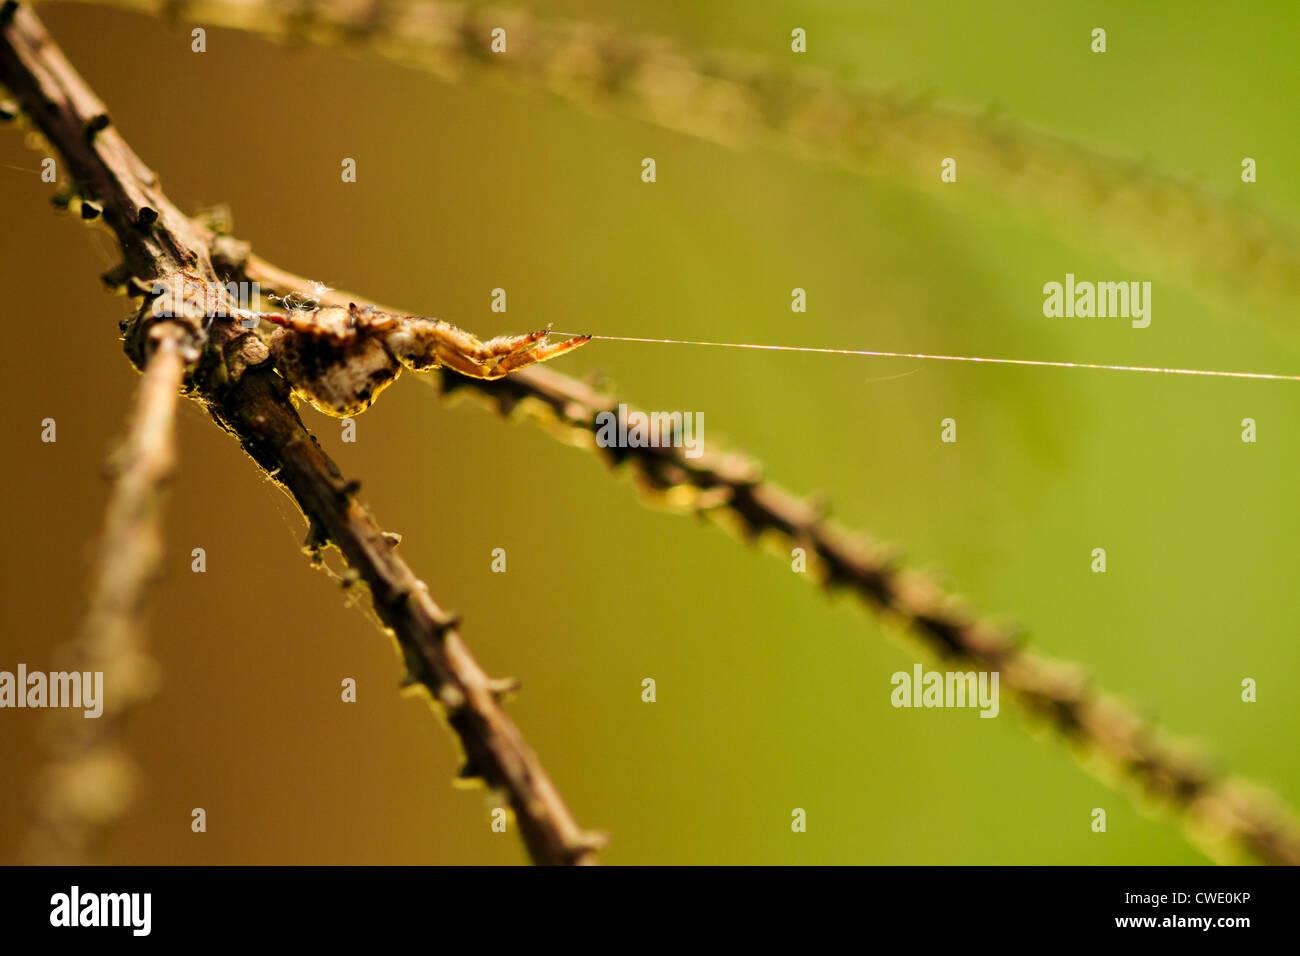 Hyptiotes paradoxus - the Triangle spider. One of few non-venomous European spiders. - Stock Image